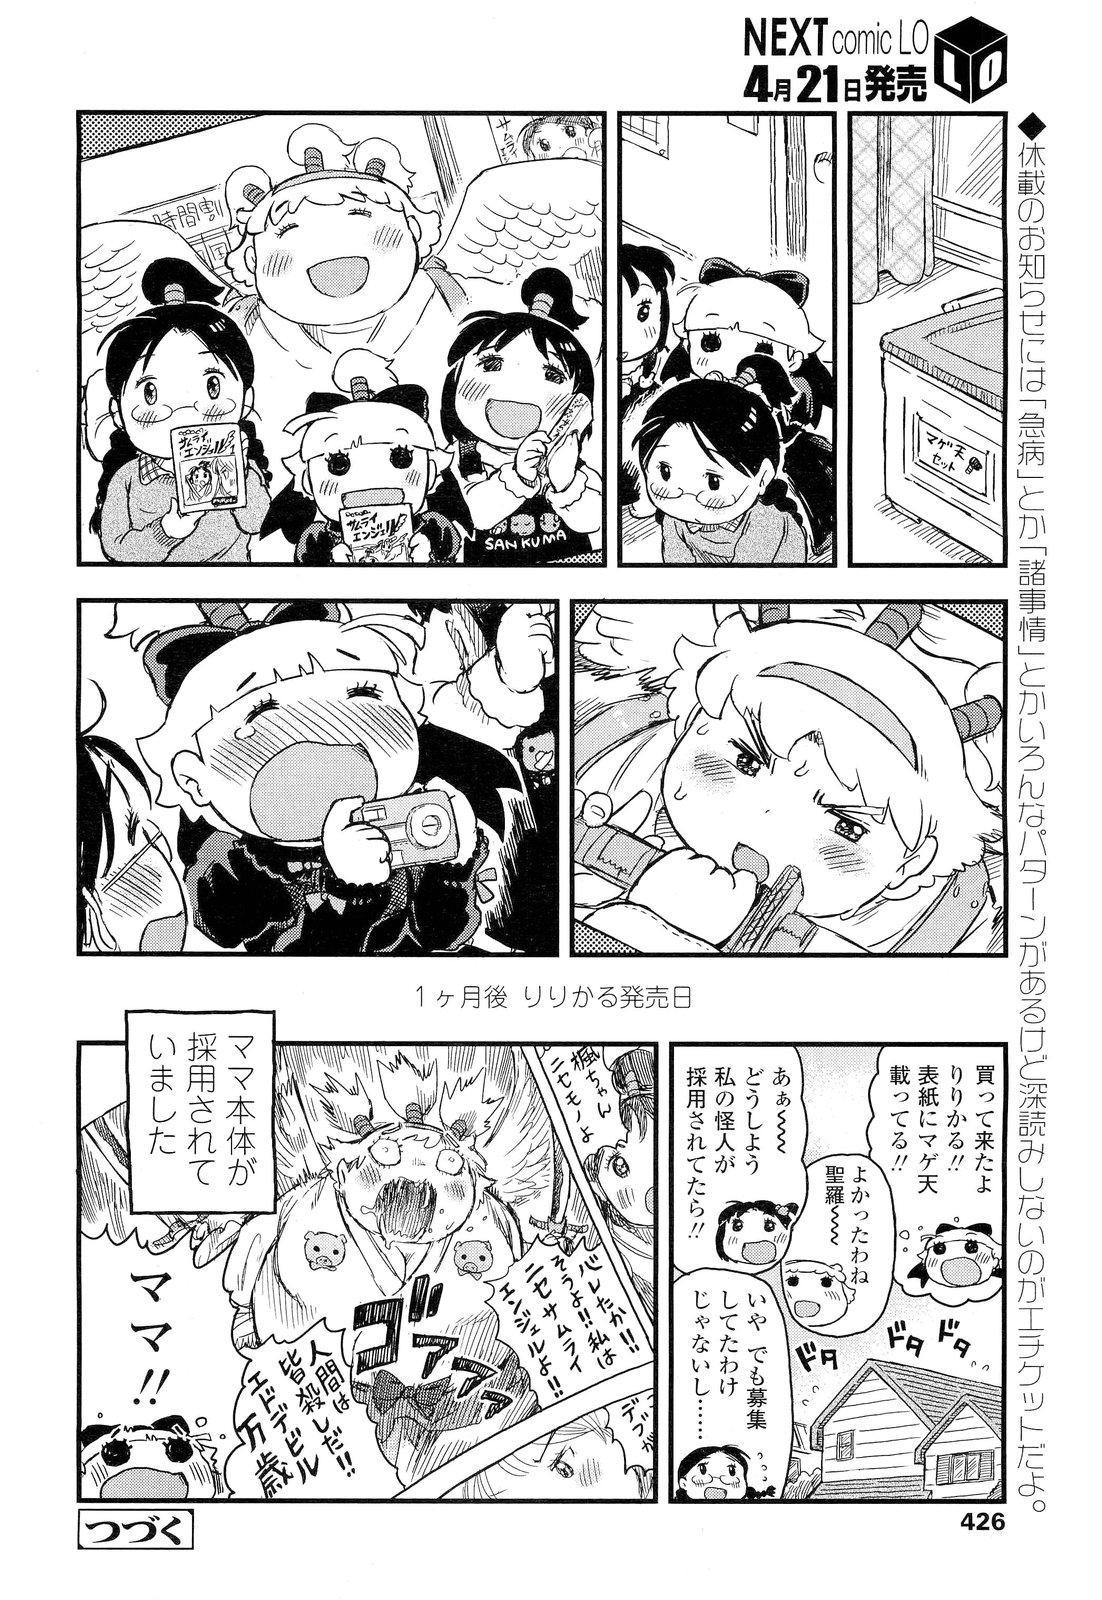 COMIC LO 2012-05 Vol. 98 425